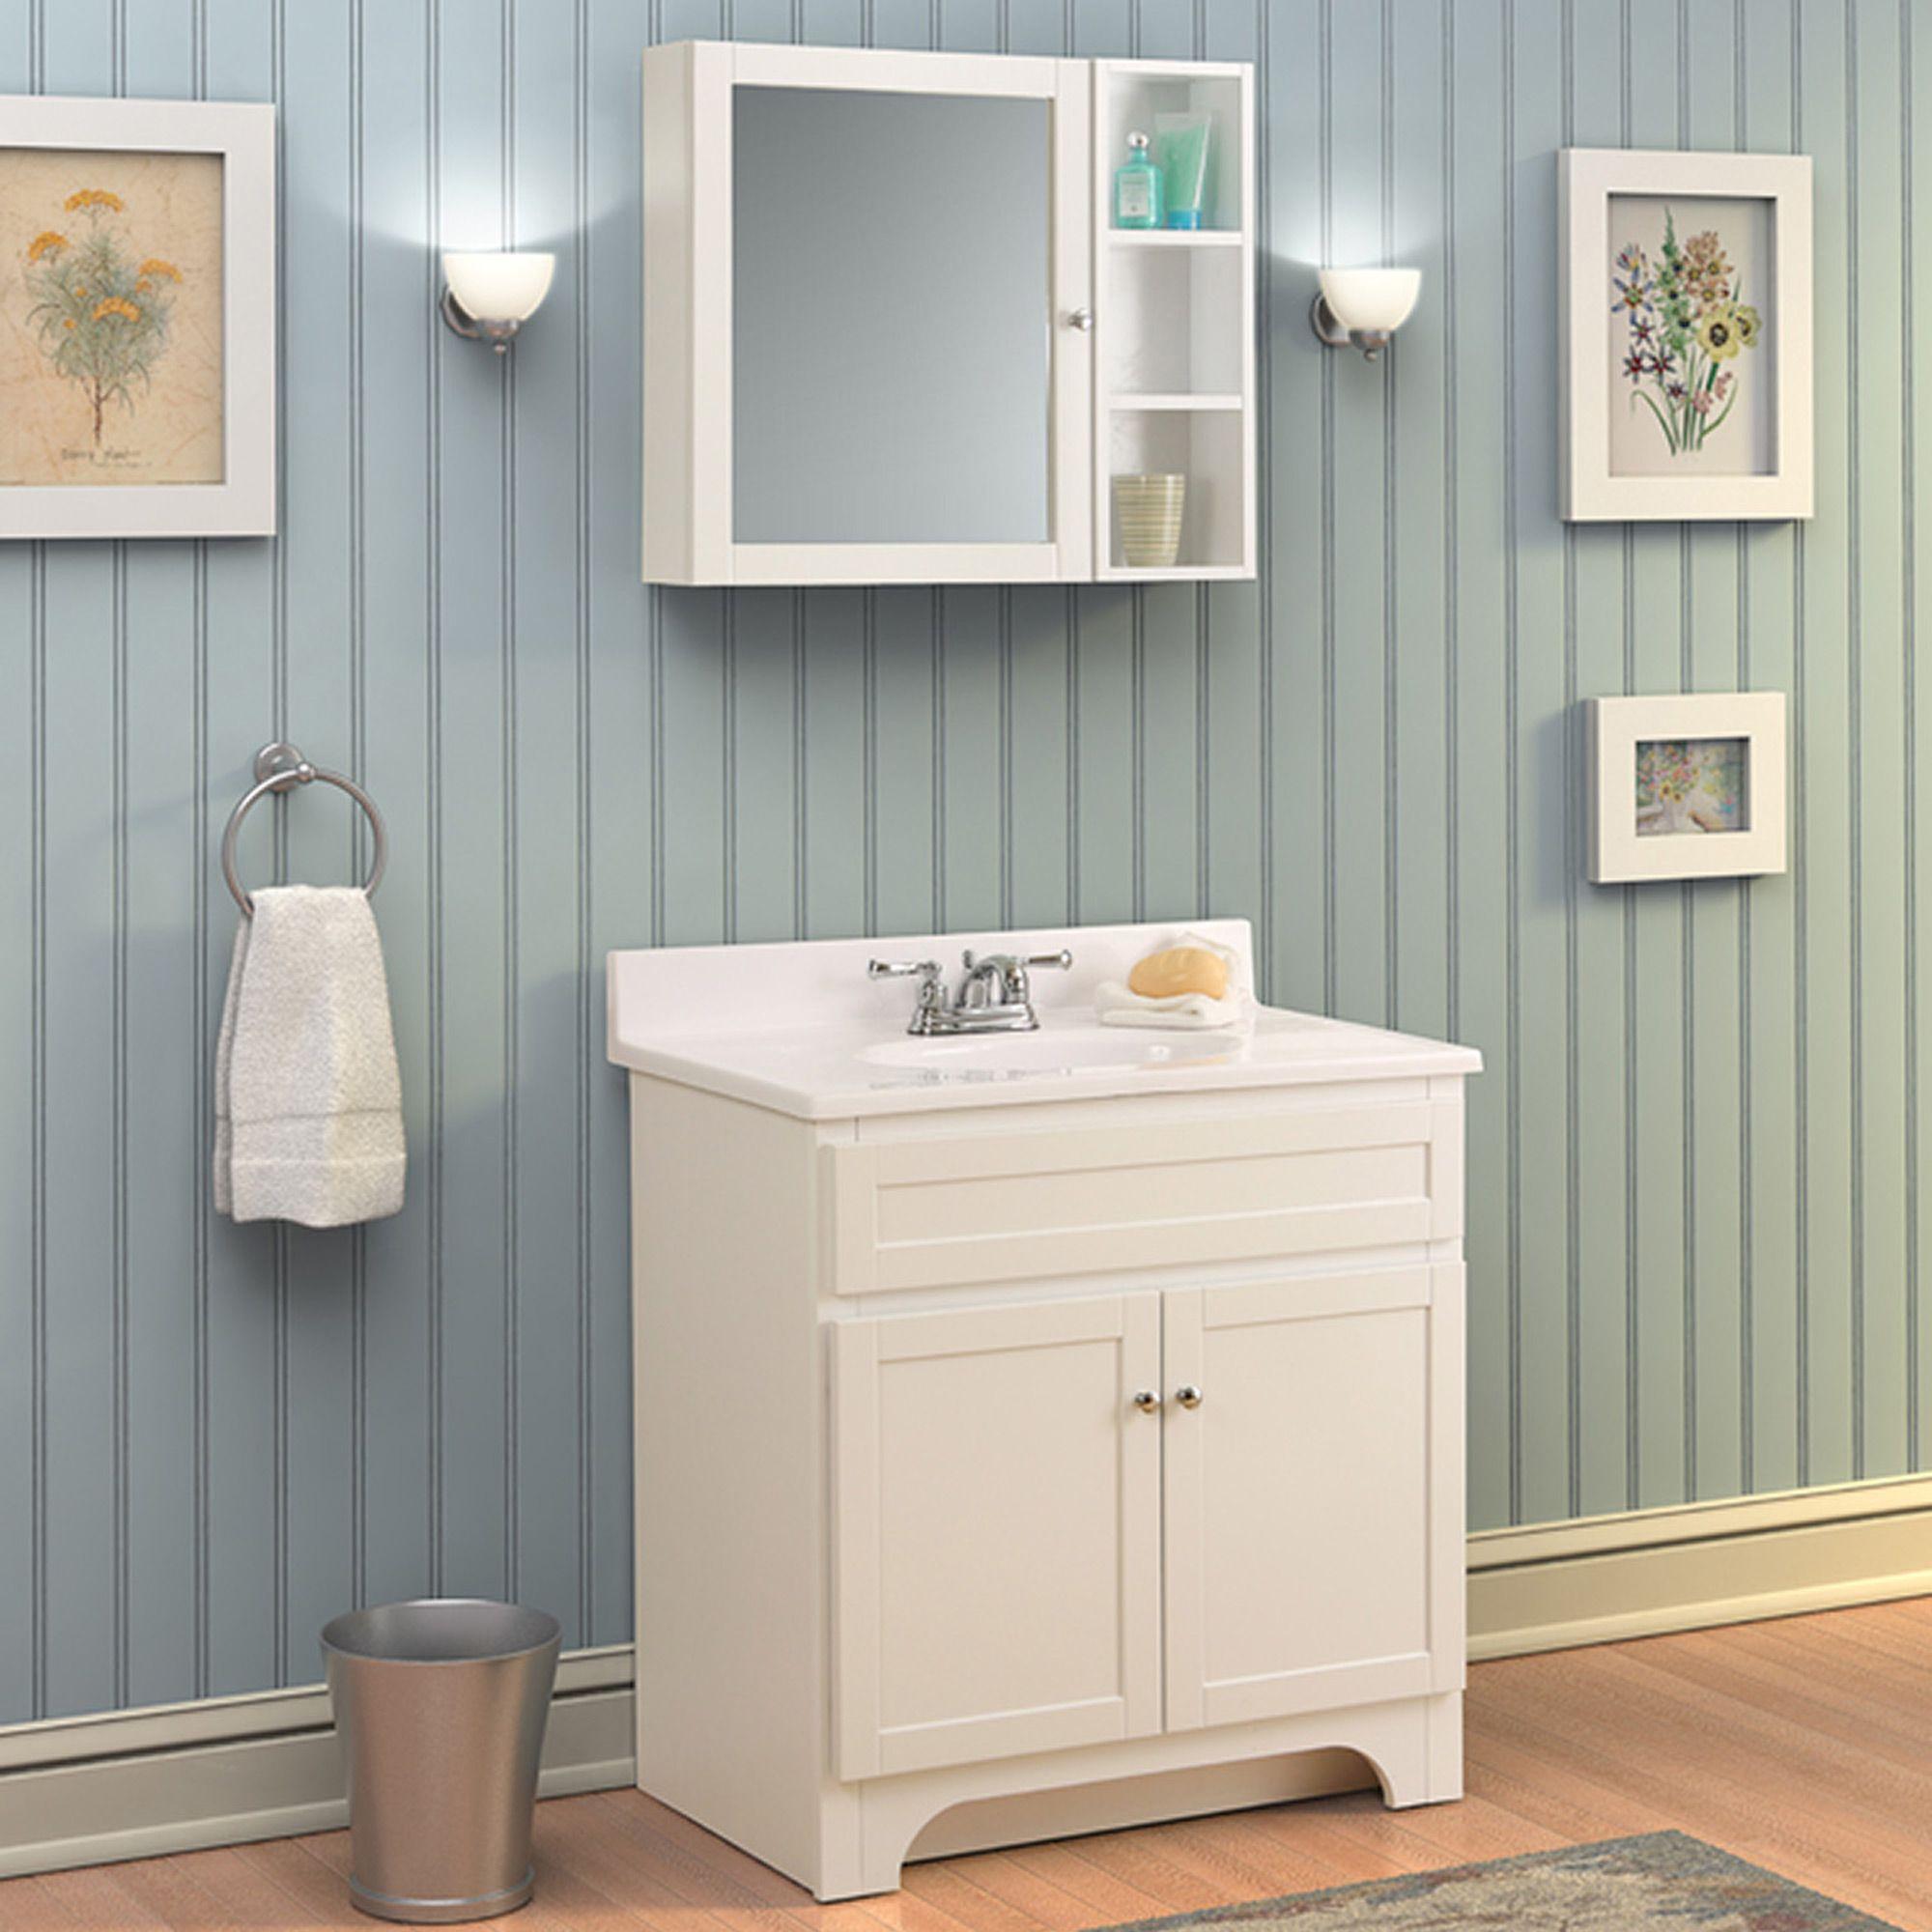 Columbia Bathroom Vanity bo Bathroom Inspiration